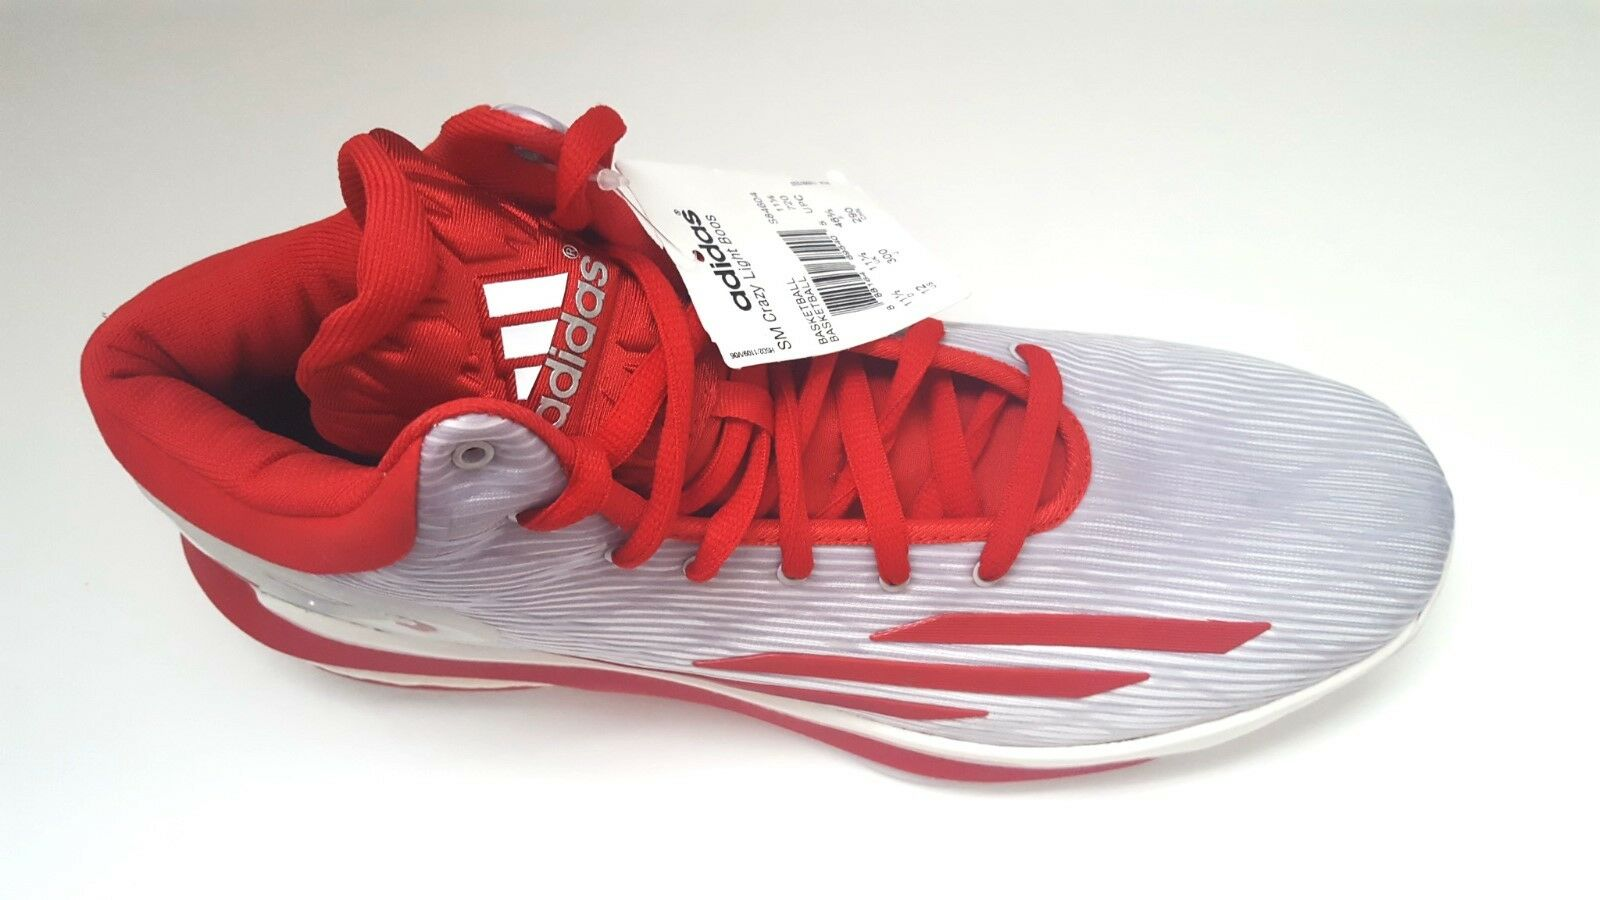 neue adidas - mann ist sm - verrückte licht boos basketball - sm schuhe sz 12us 0919d2